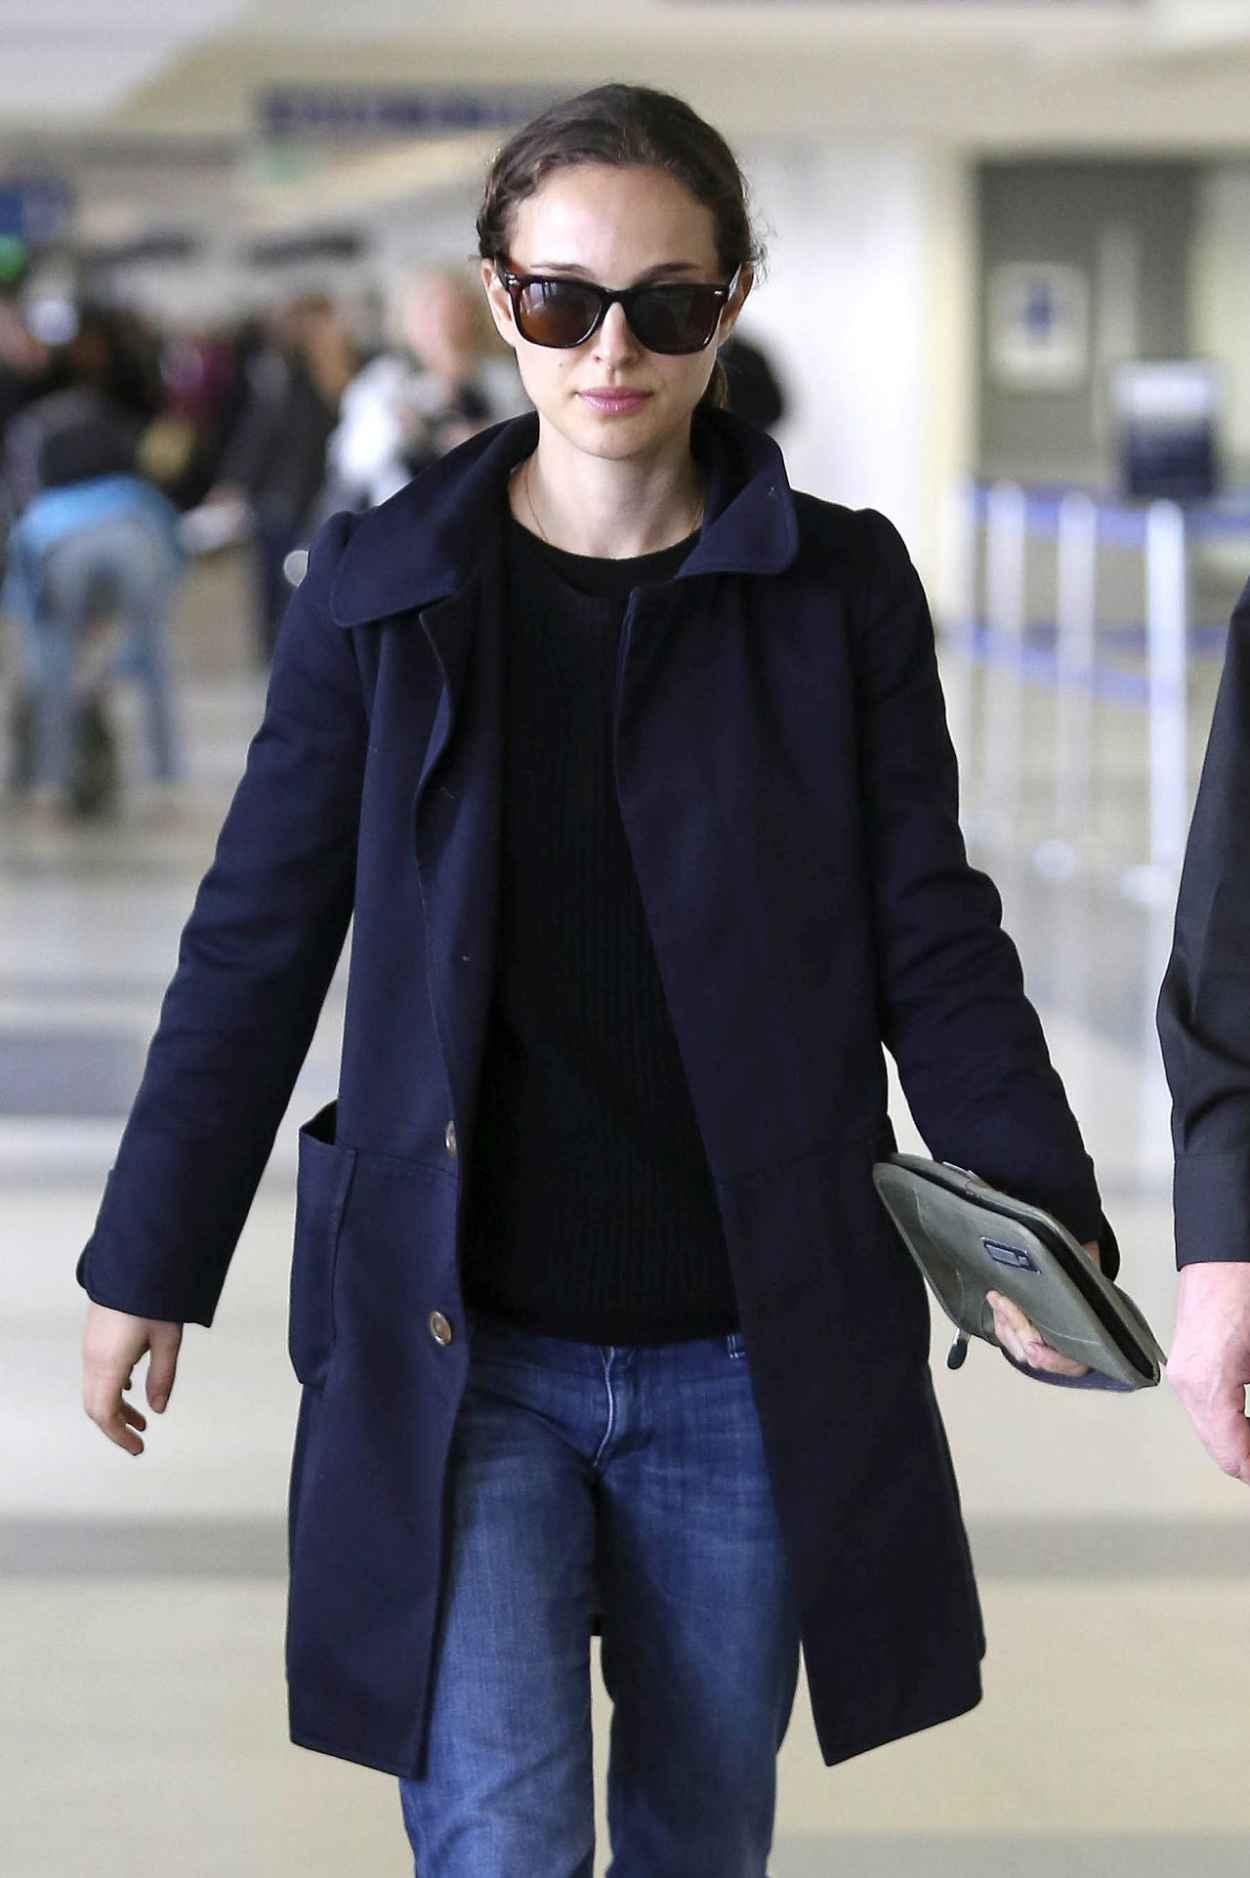 Natalie Portman Street Style - at LAX Airport - November 2015-1